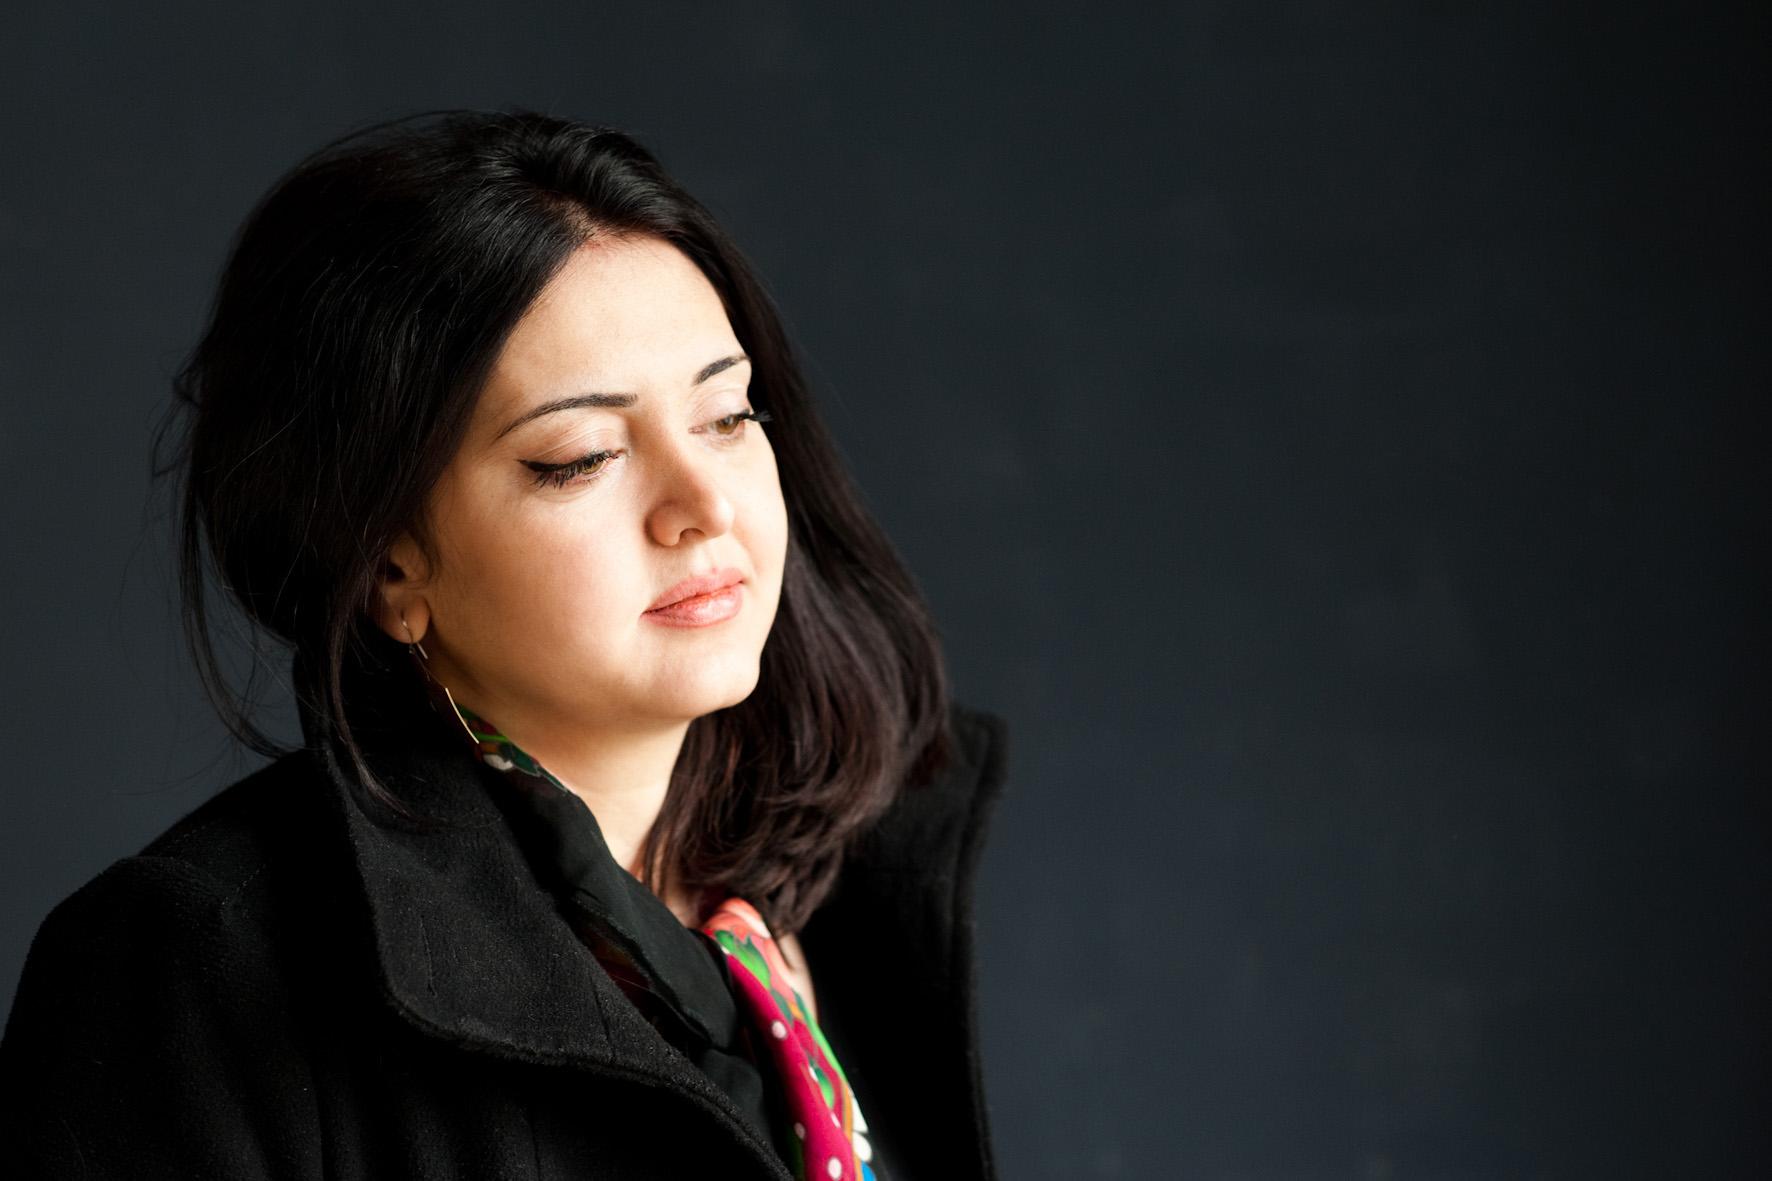 Rasha Abbas (Photo by Heike Steinweg)